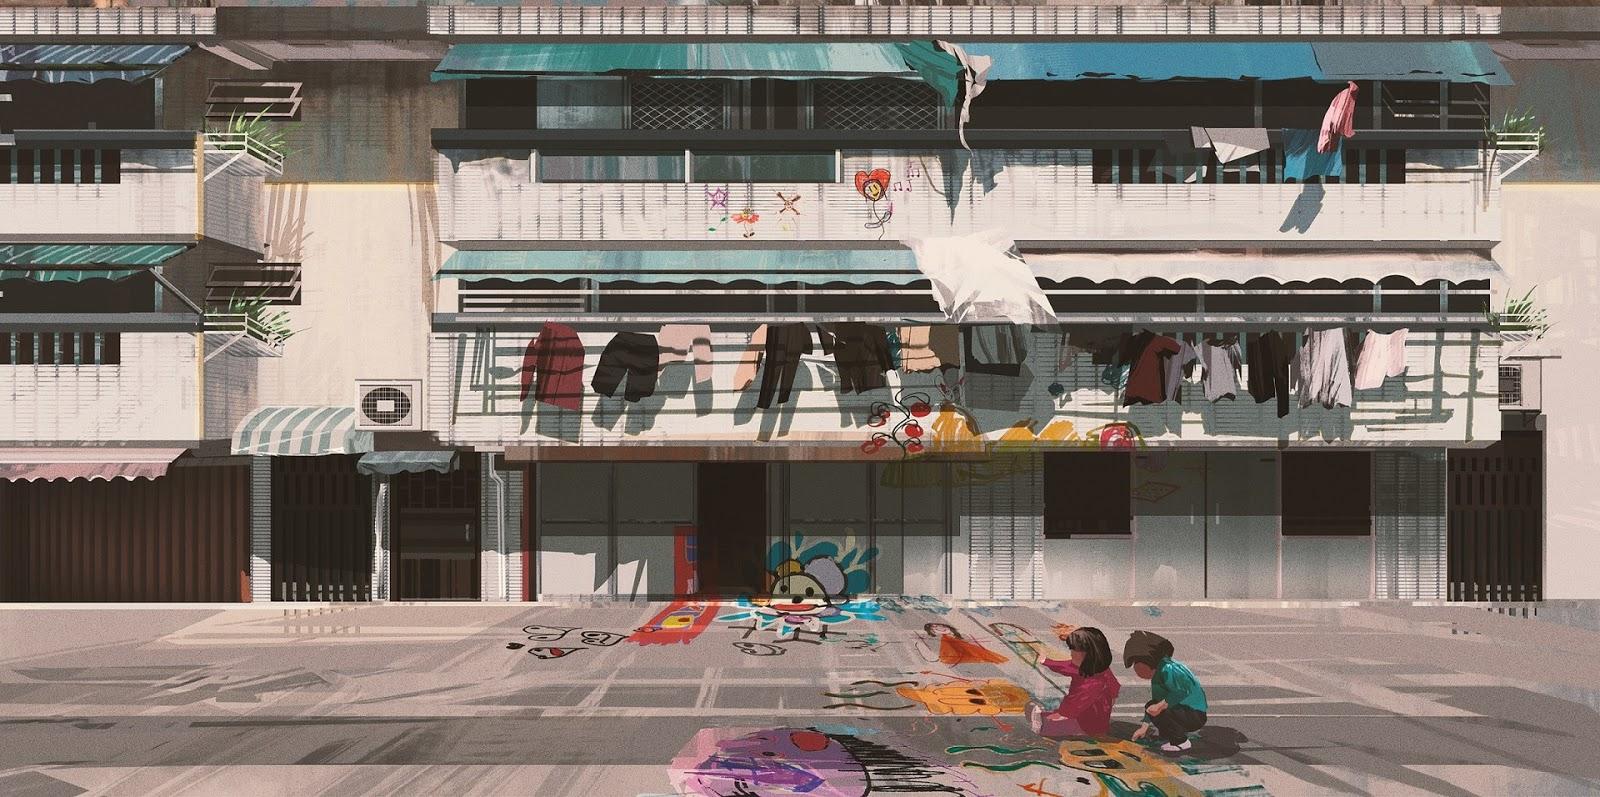 Concept Art by Donglu Yu